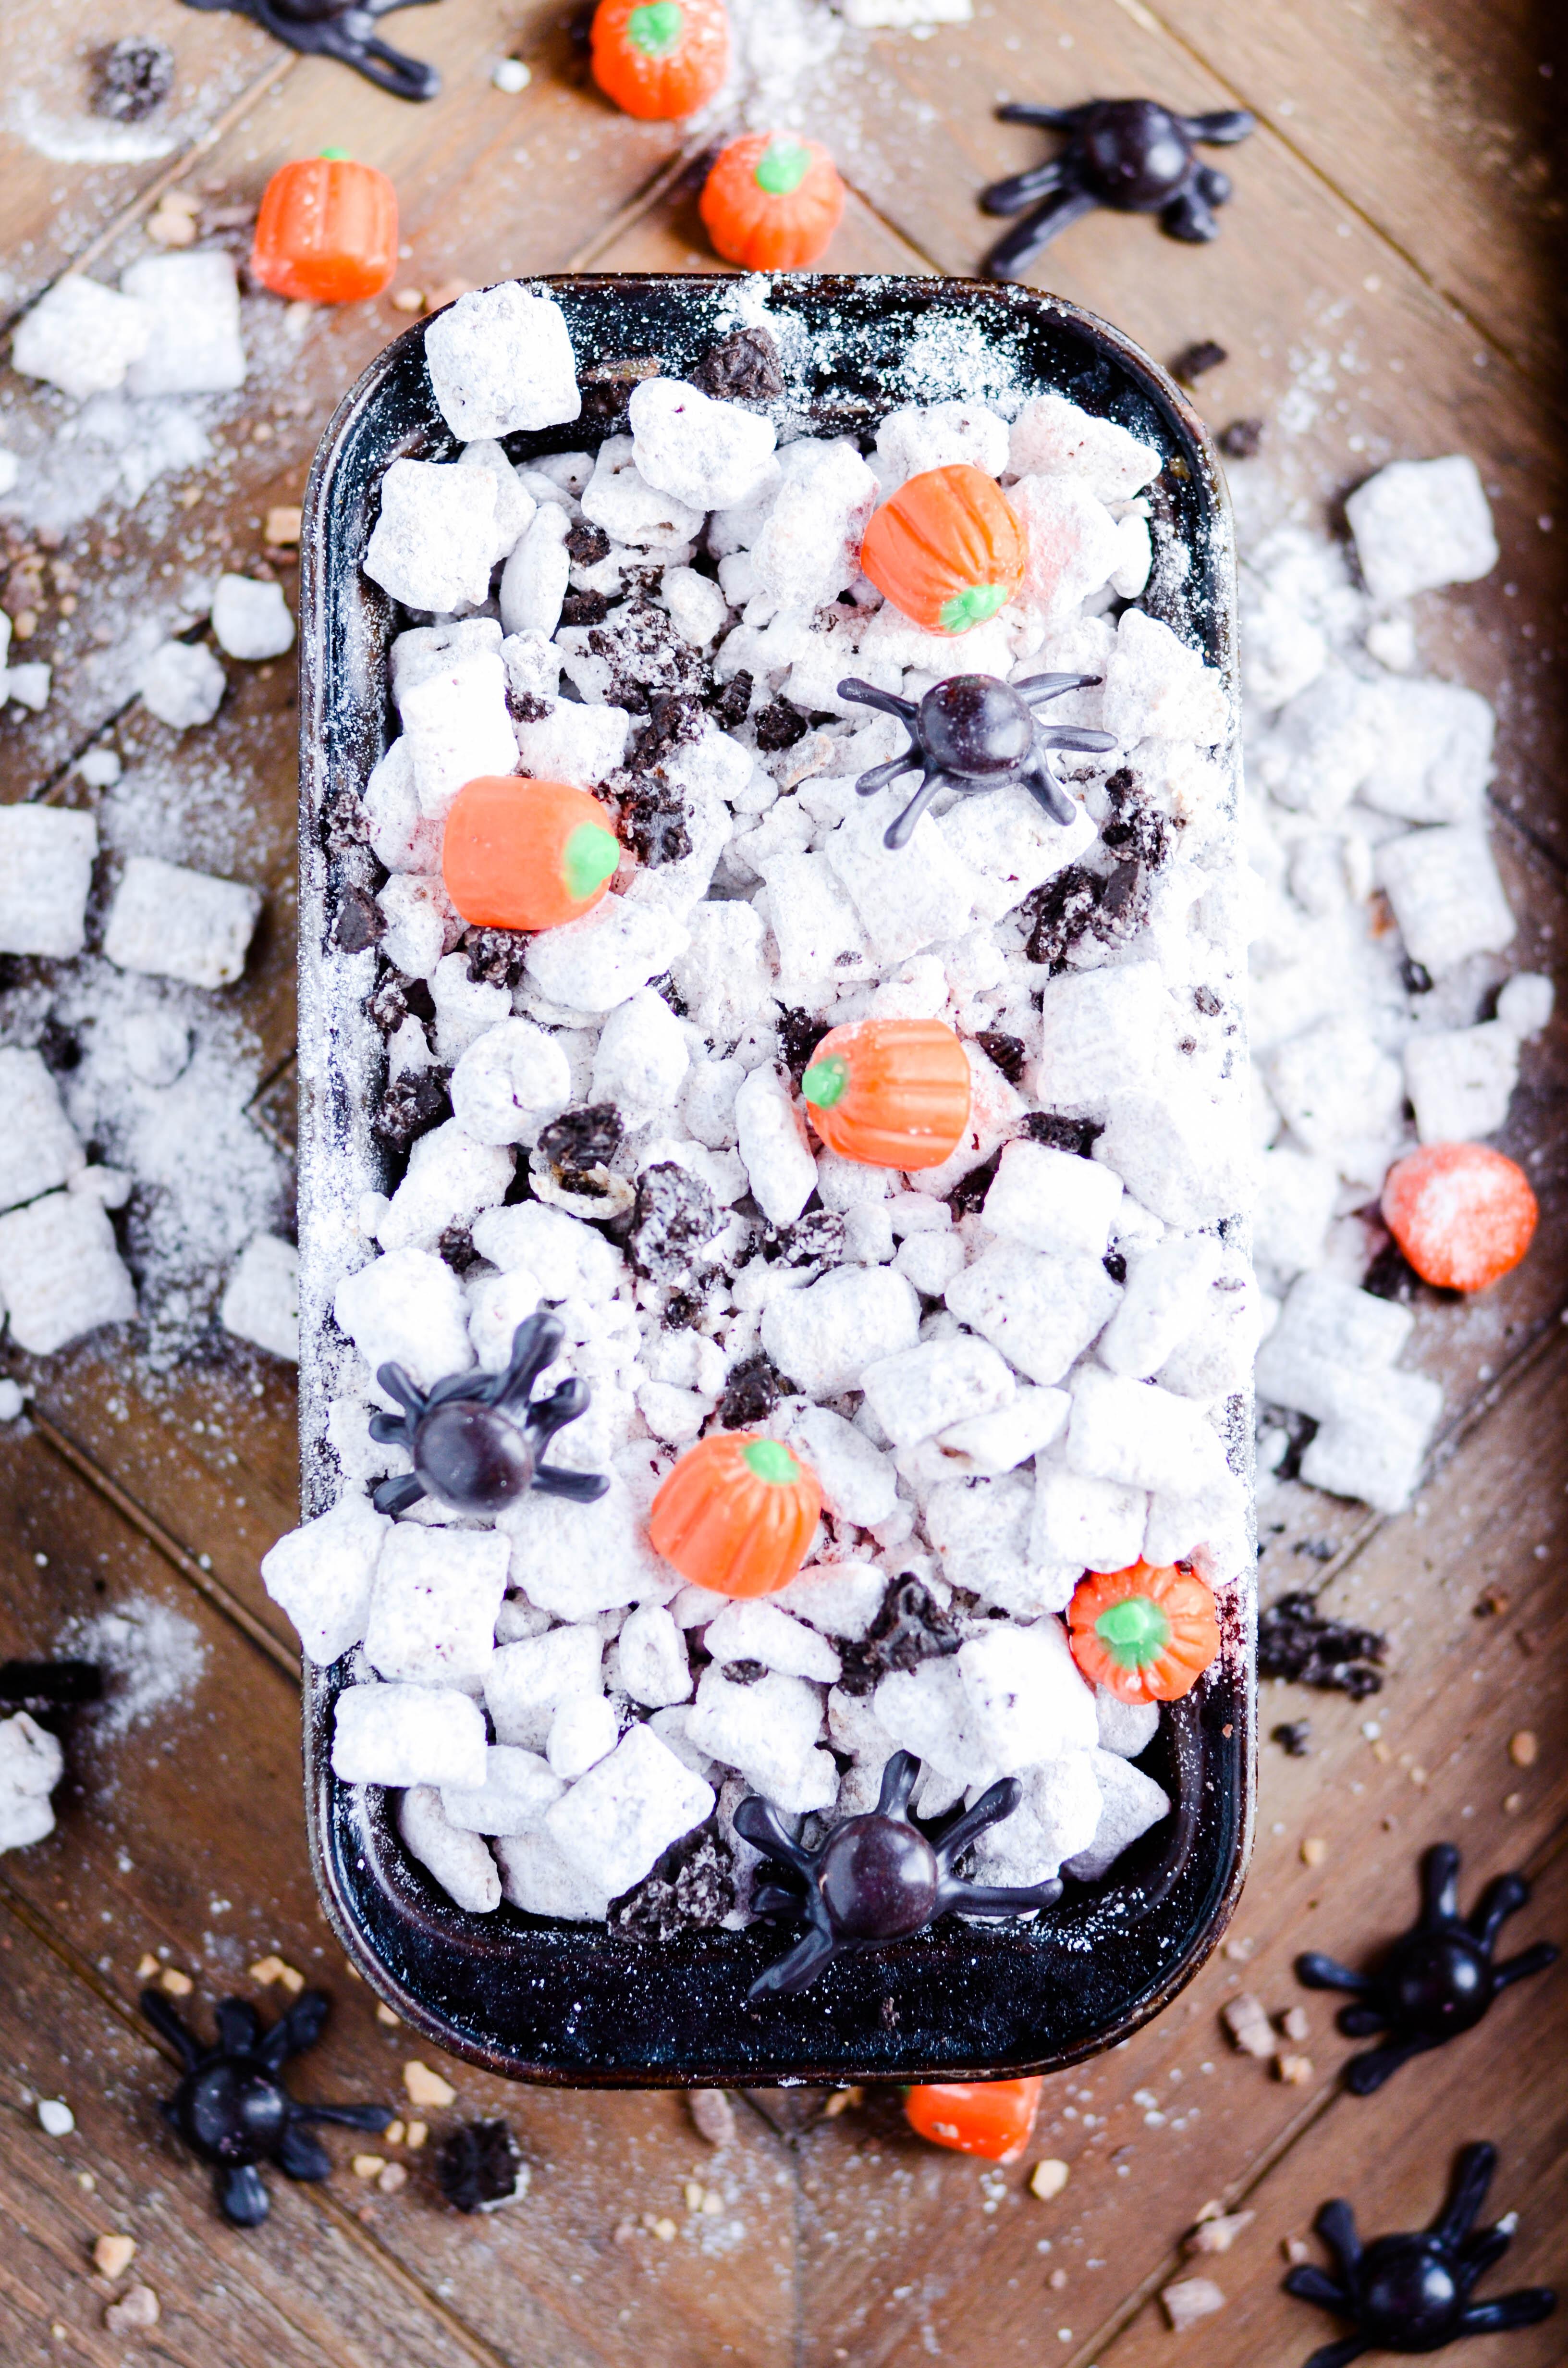 An easy recipe for Pumpkin Oreo Muddy Buddies (Puppy Chow)